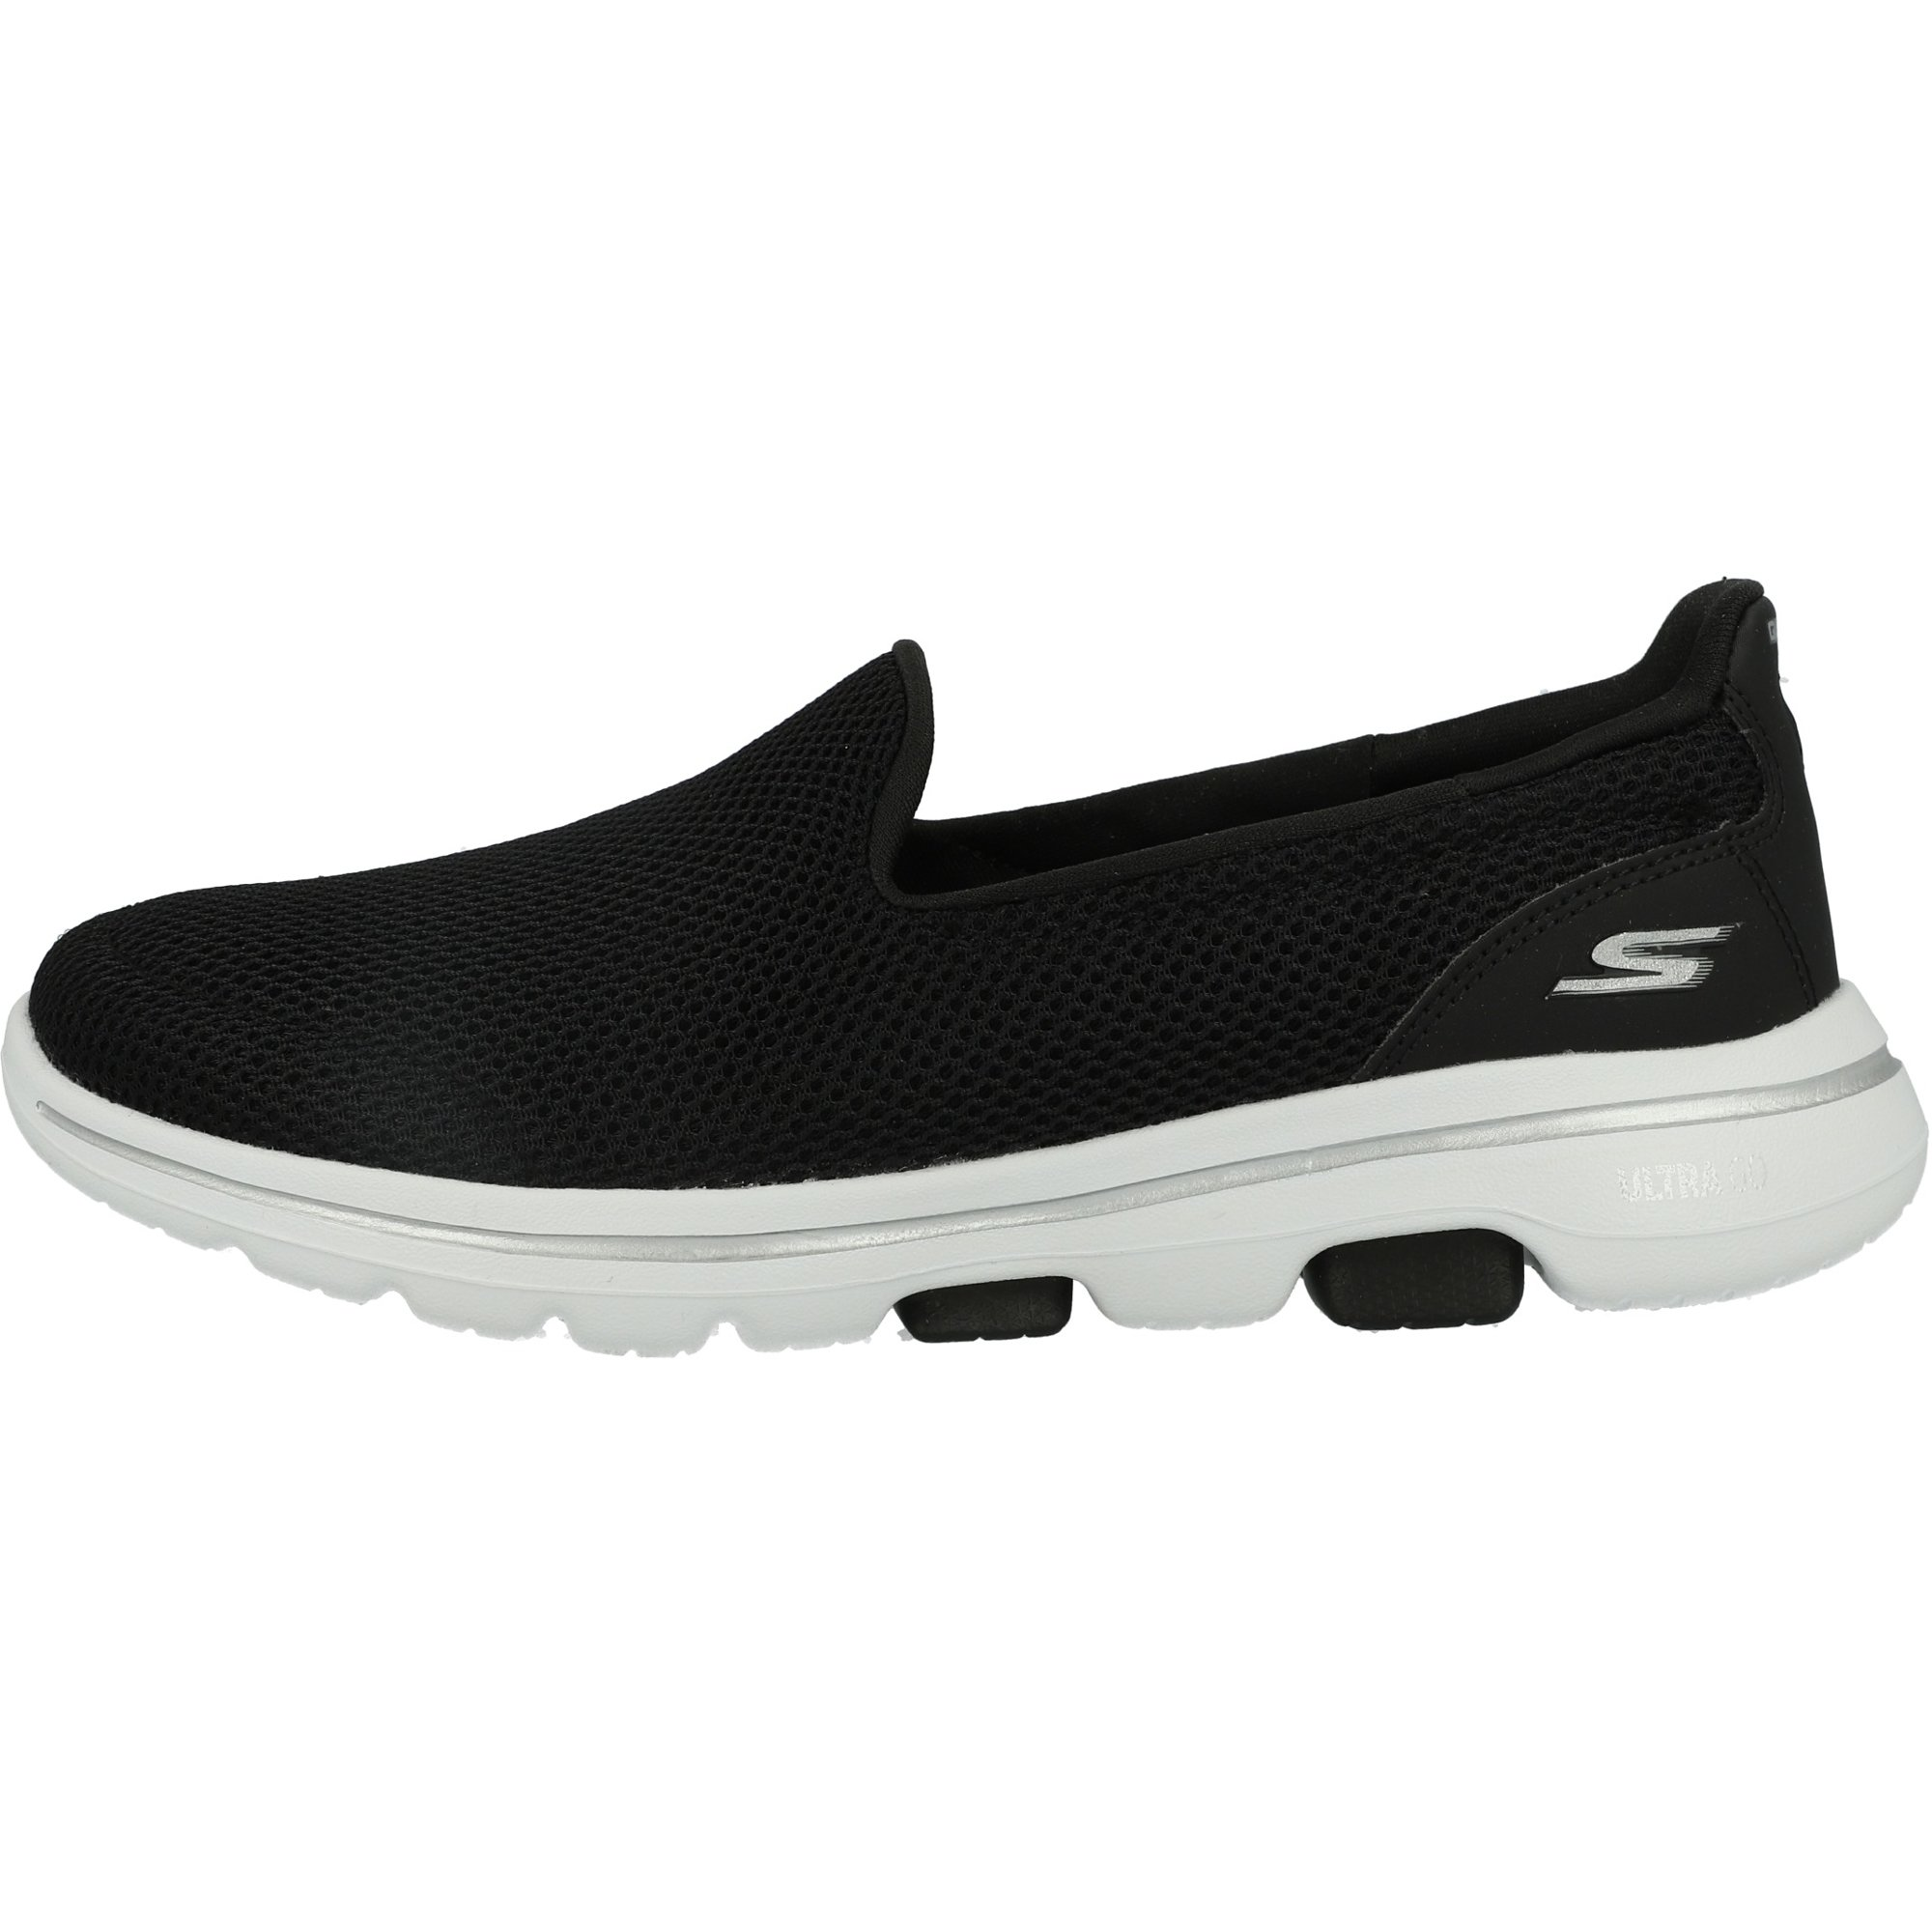 Skechers Go Walk 5 Black/White Mesh